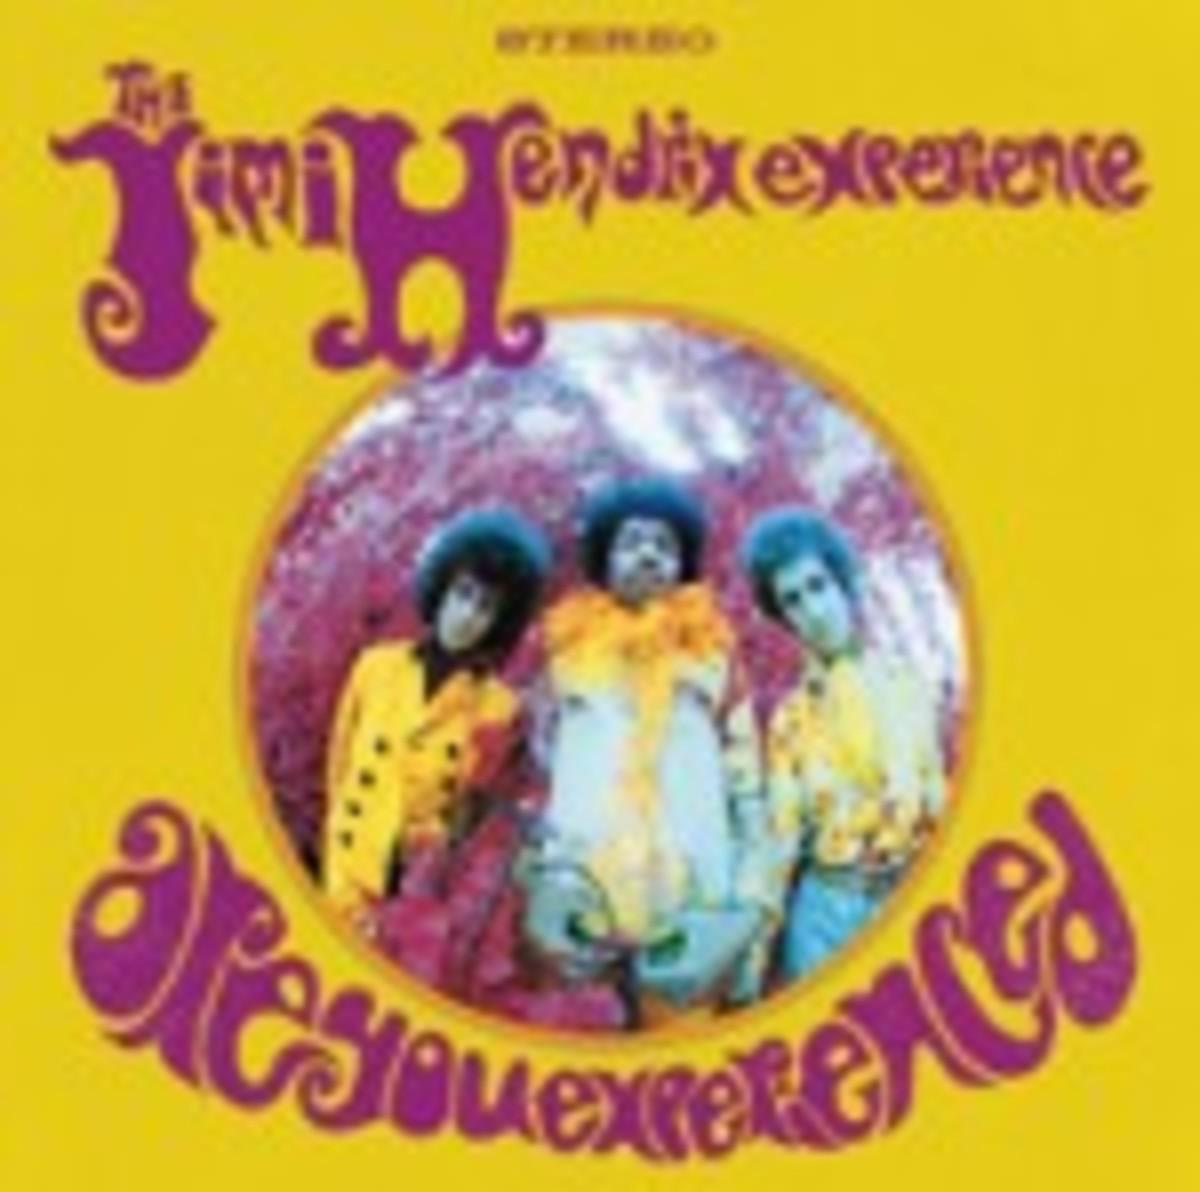 Jimi Hendrix Are You Experienced?